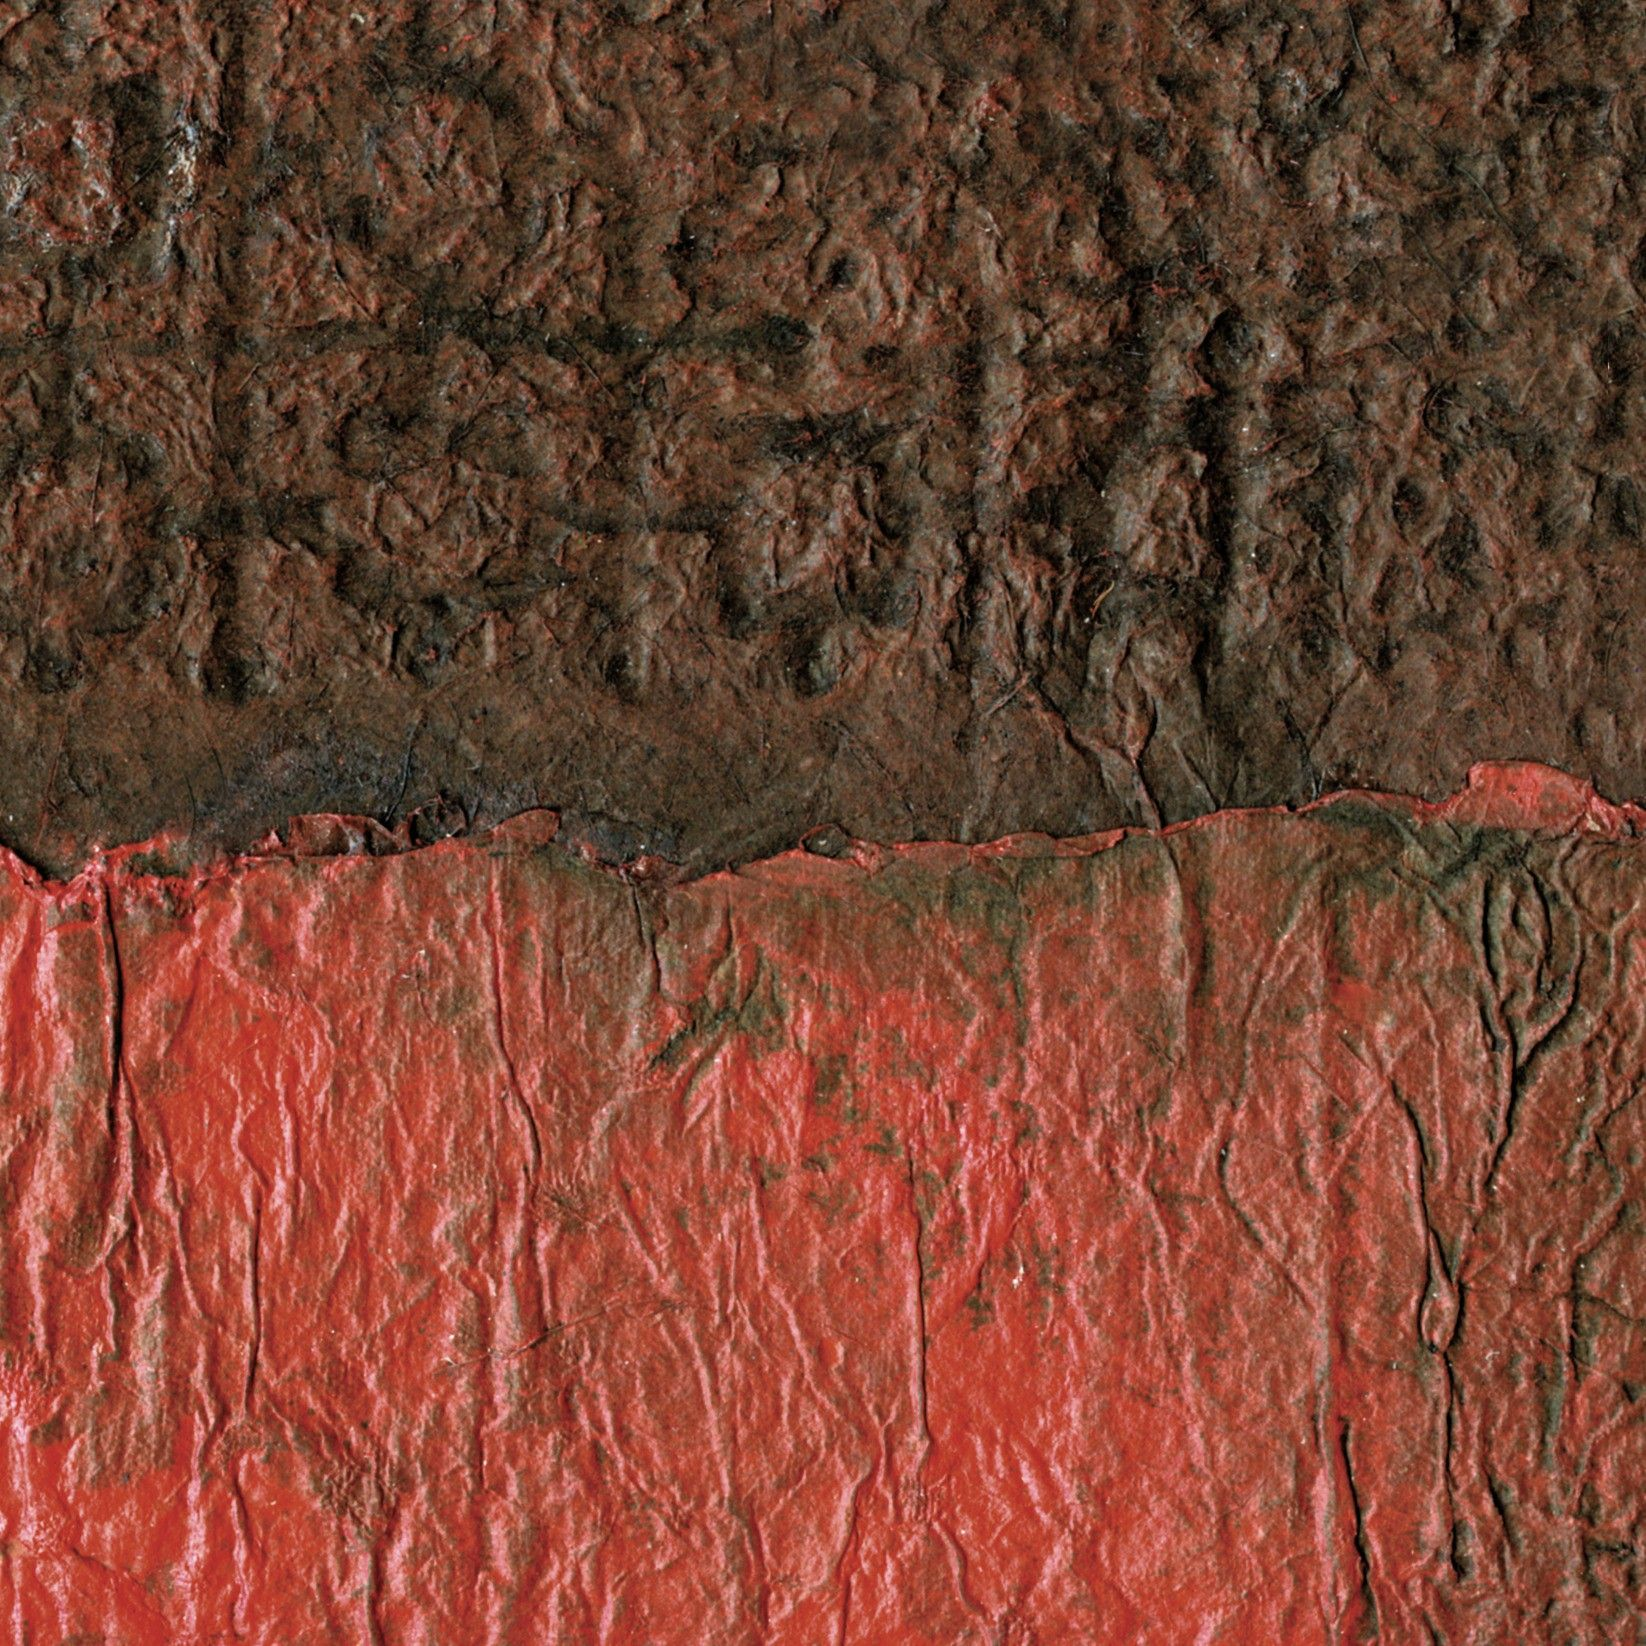 Revetement Lapu Lapu Mindoro Papaye Elitis Papier Peint Papier Peint Elitis Et Parement Mural